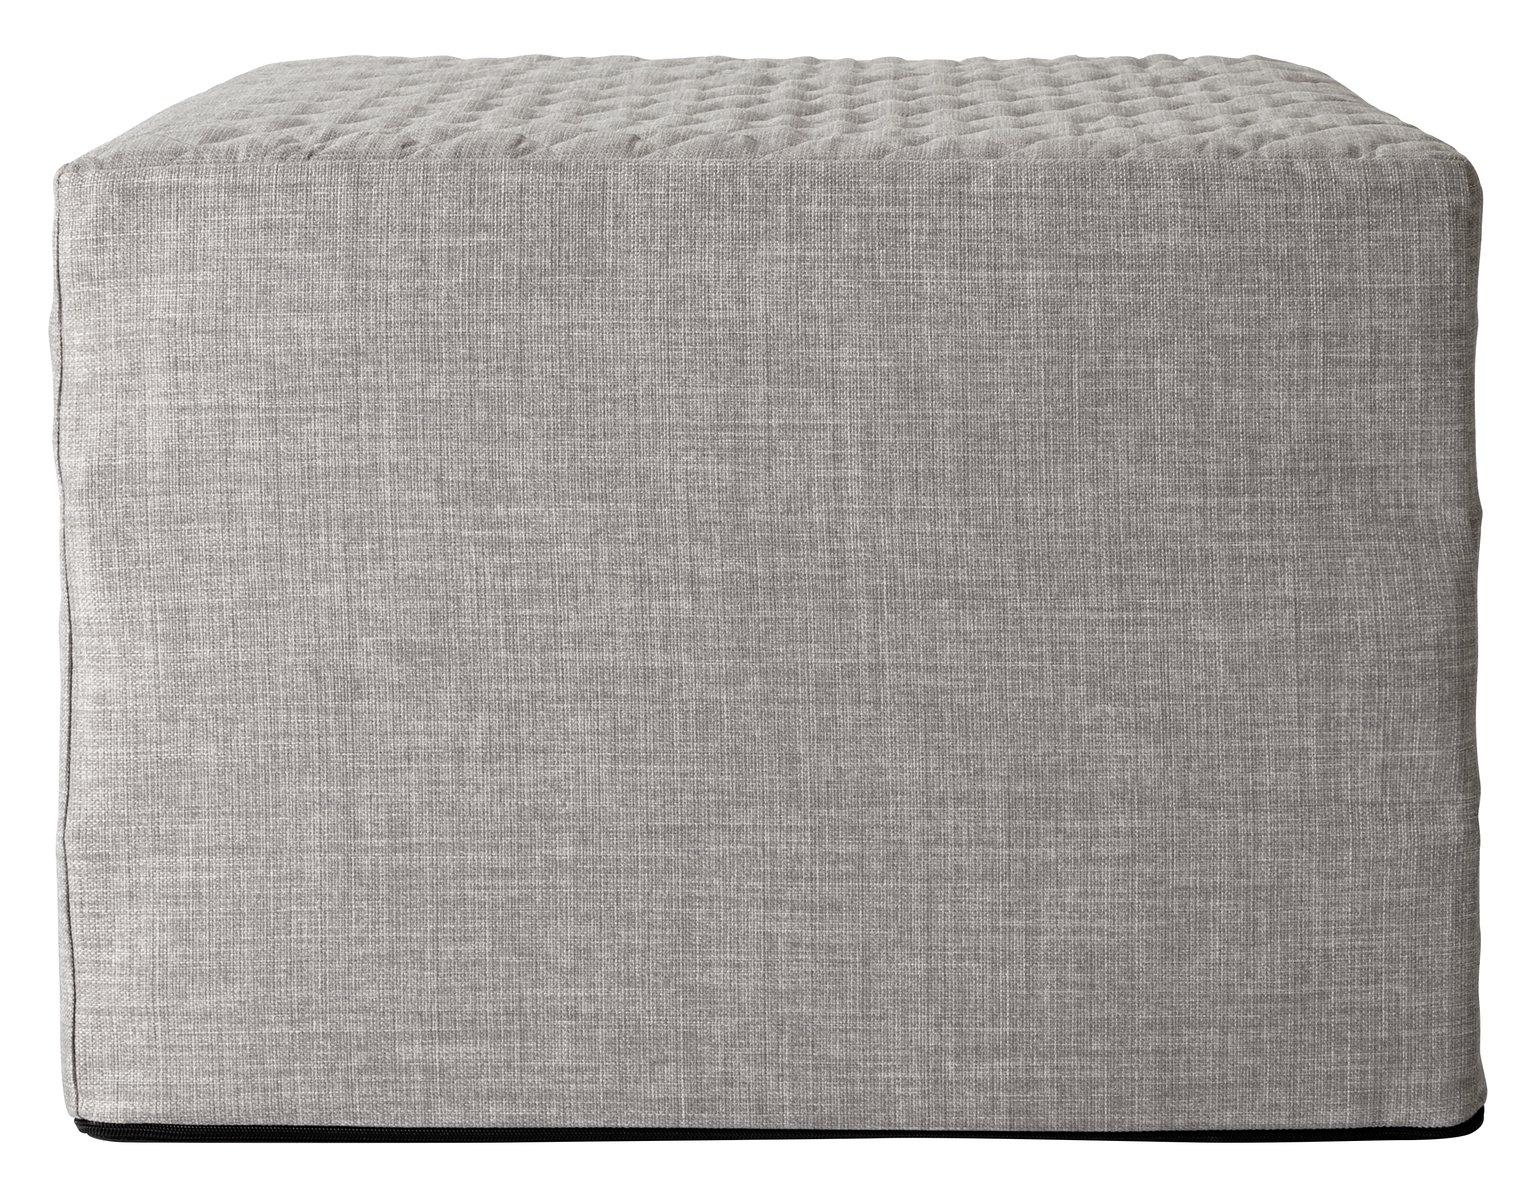 Argos Home Prim Fabric Single Ottoman Bed - Light Grey at Argos